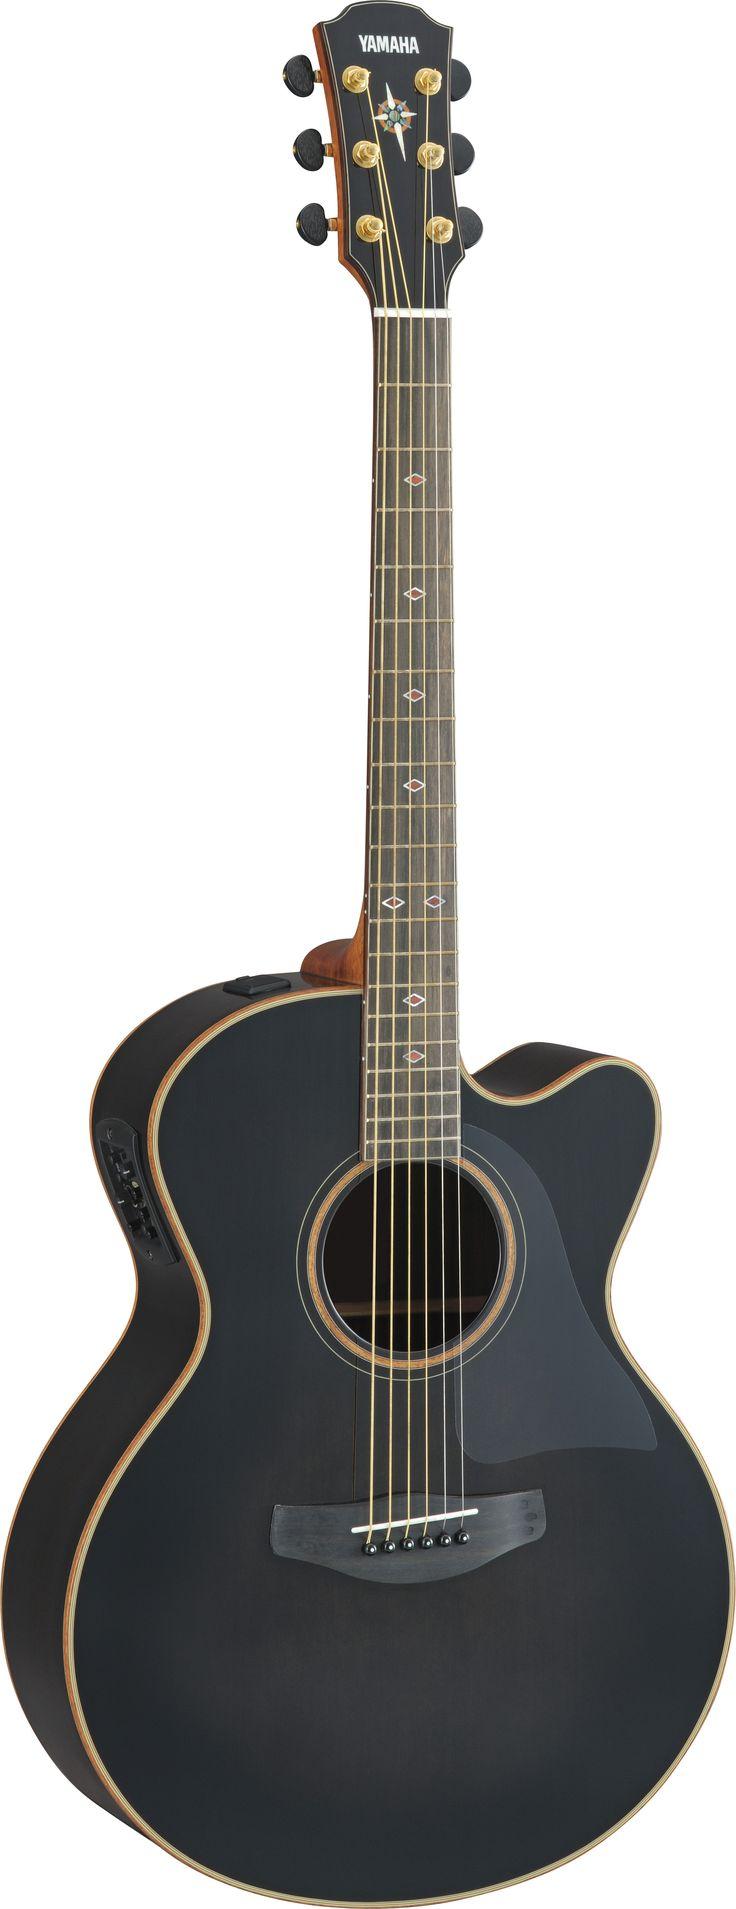 728 best beautiful acoustic guitars images on pinterest. Black Bedroom Furniture Sets. Home Design Ideas